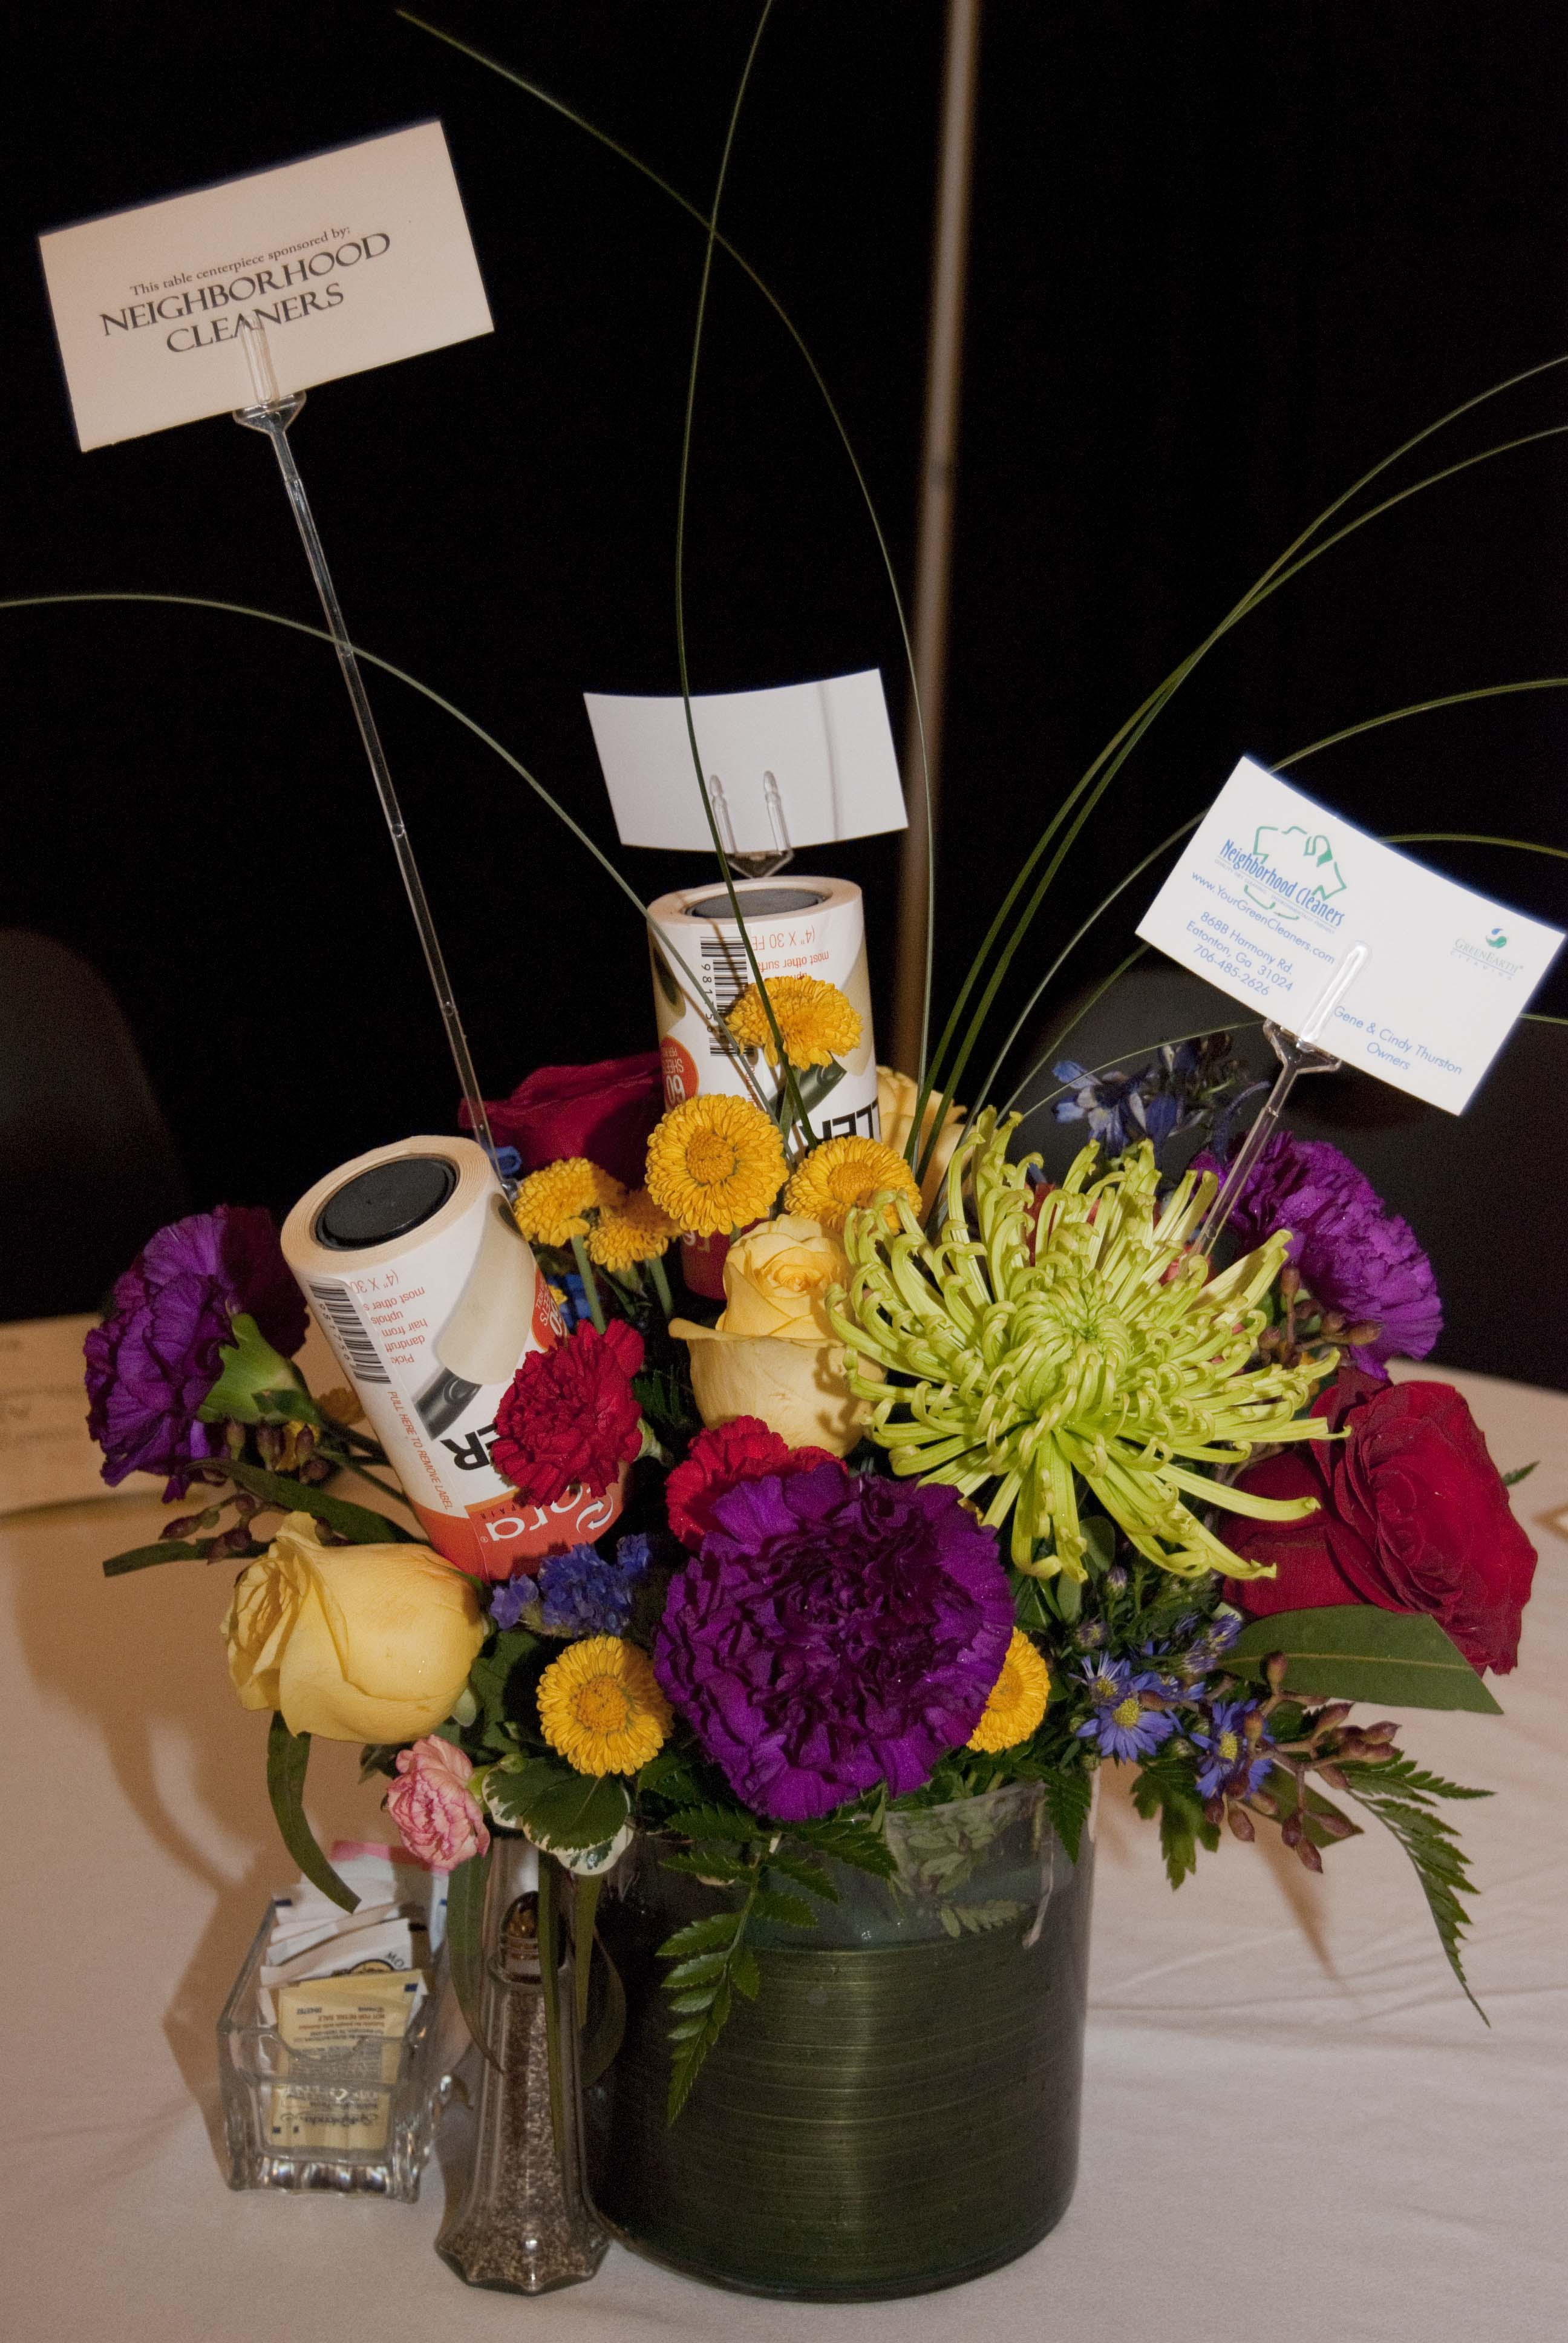 Eatonton putnam chamber of commerce rd annual awards